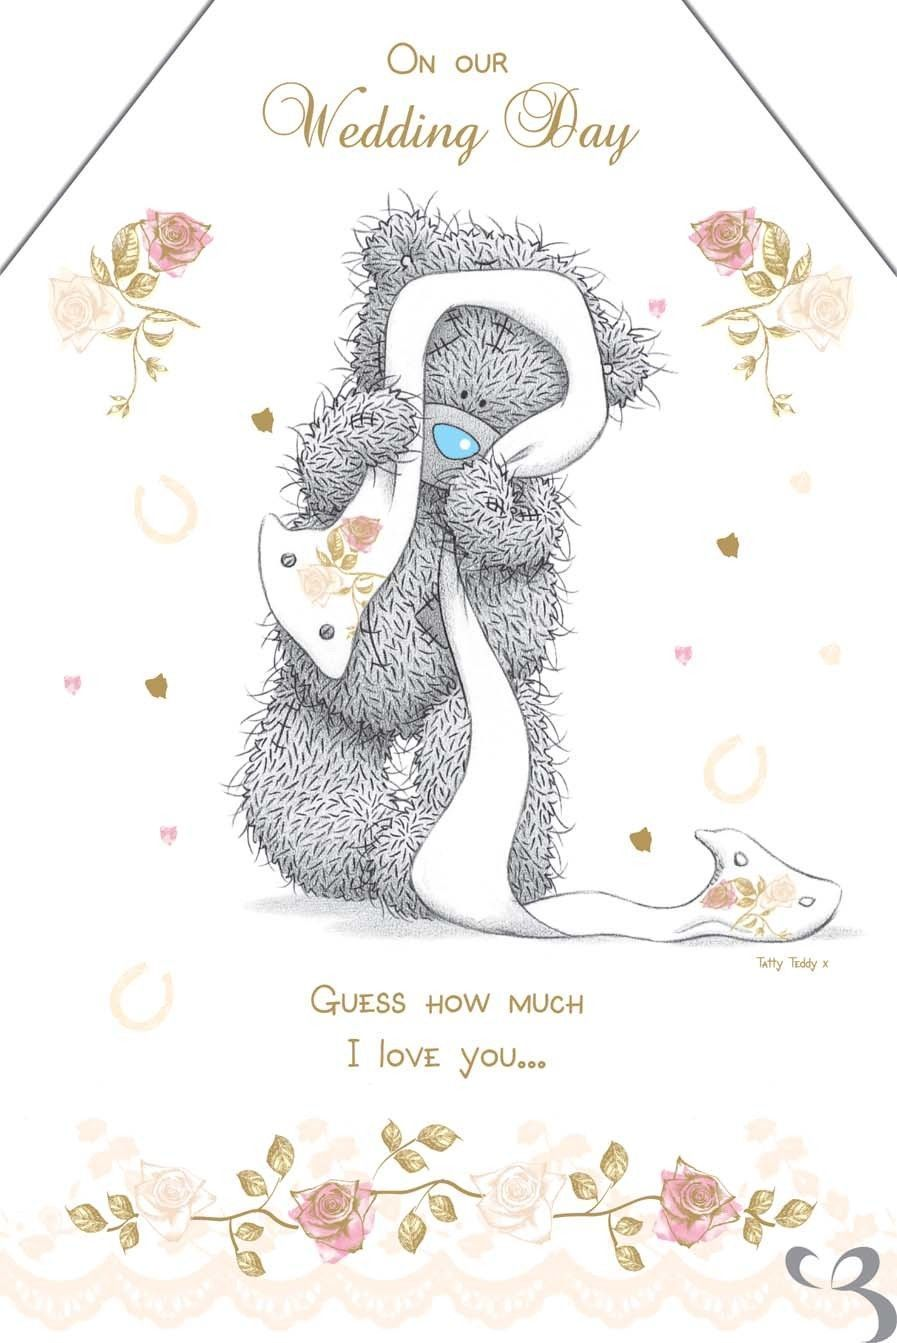 Tatty Teddy Me To You Wedding Card Wedding Day I Love You Greetings Card